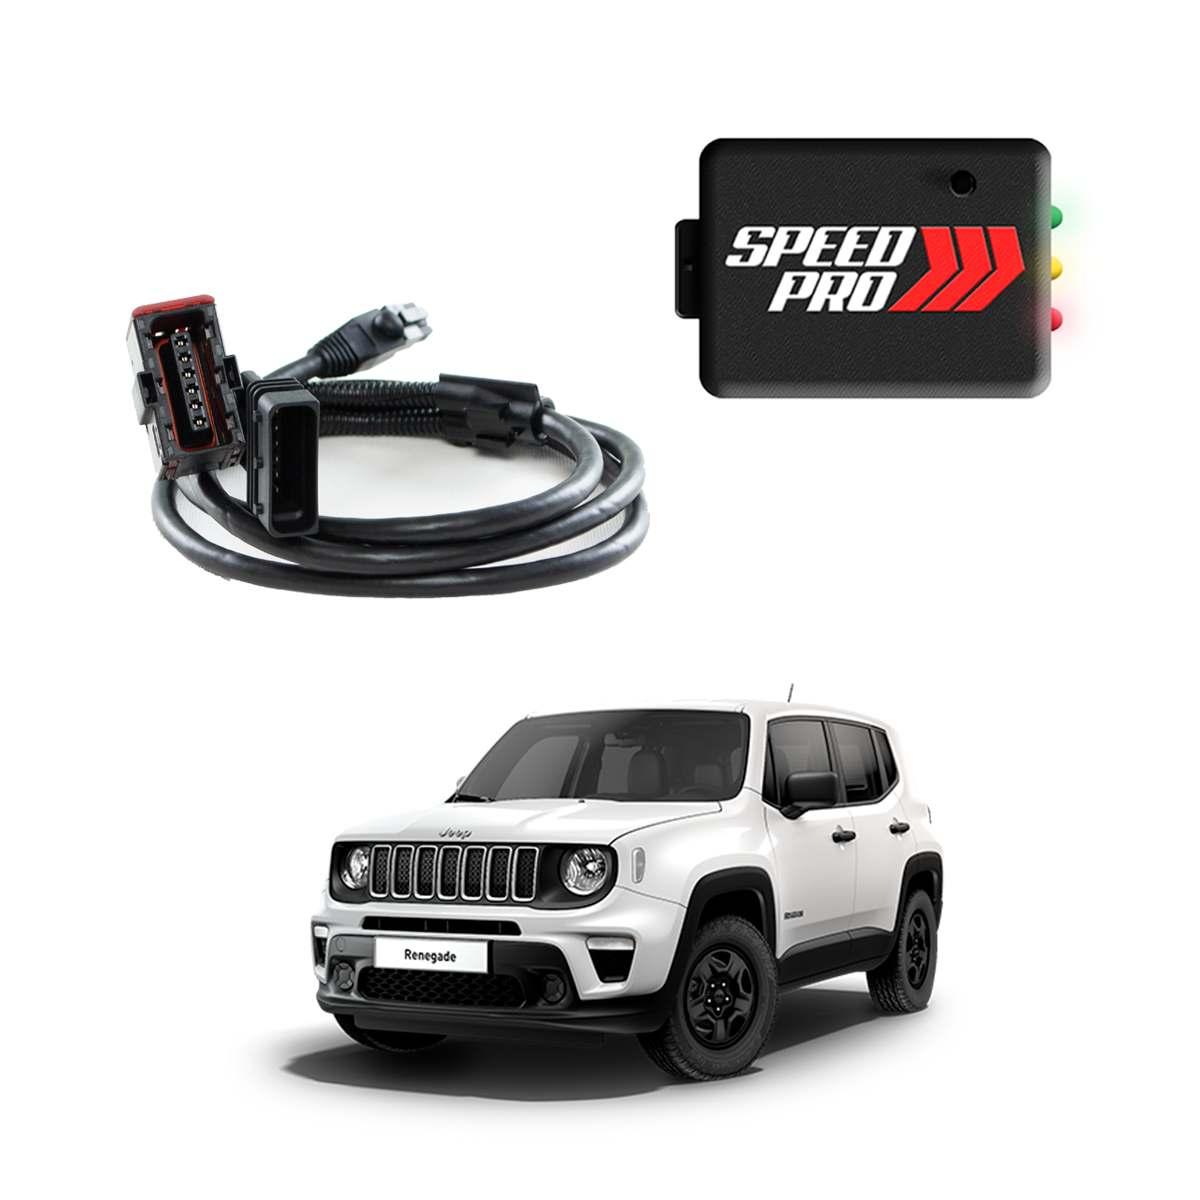 Chip De Potência Para Pedal Speedpro Para Jeep Renegade